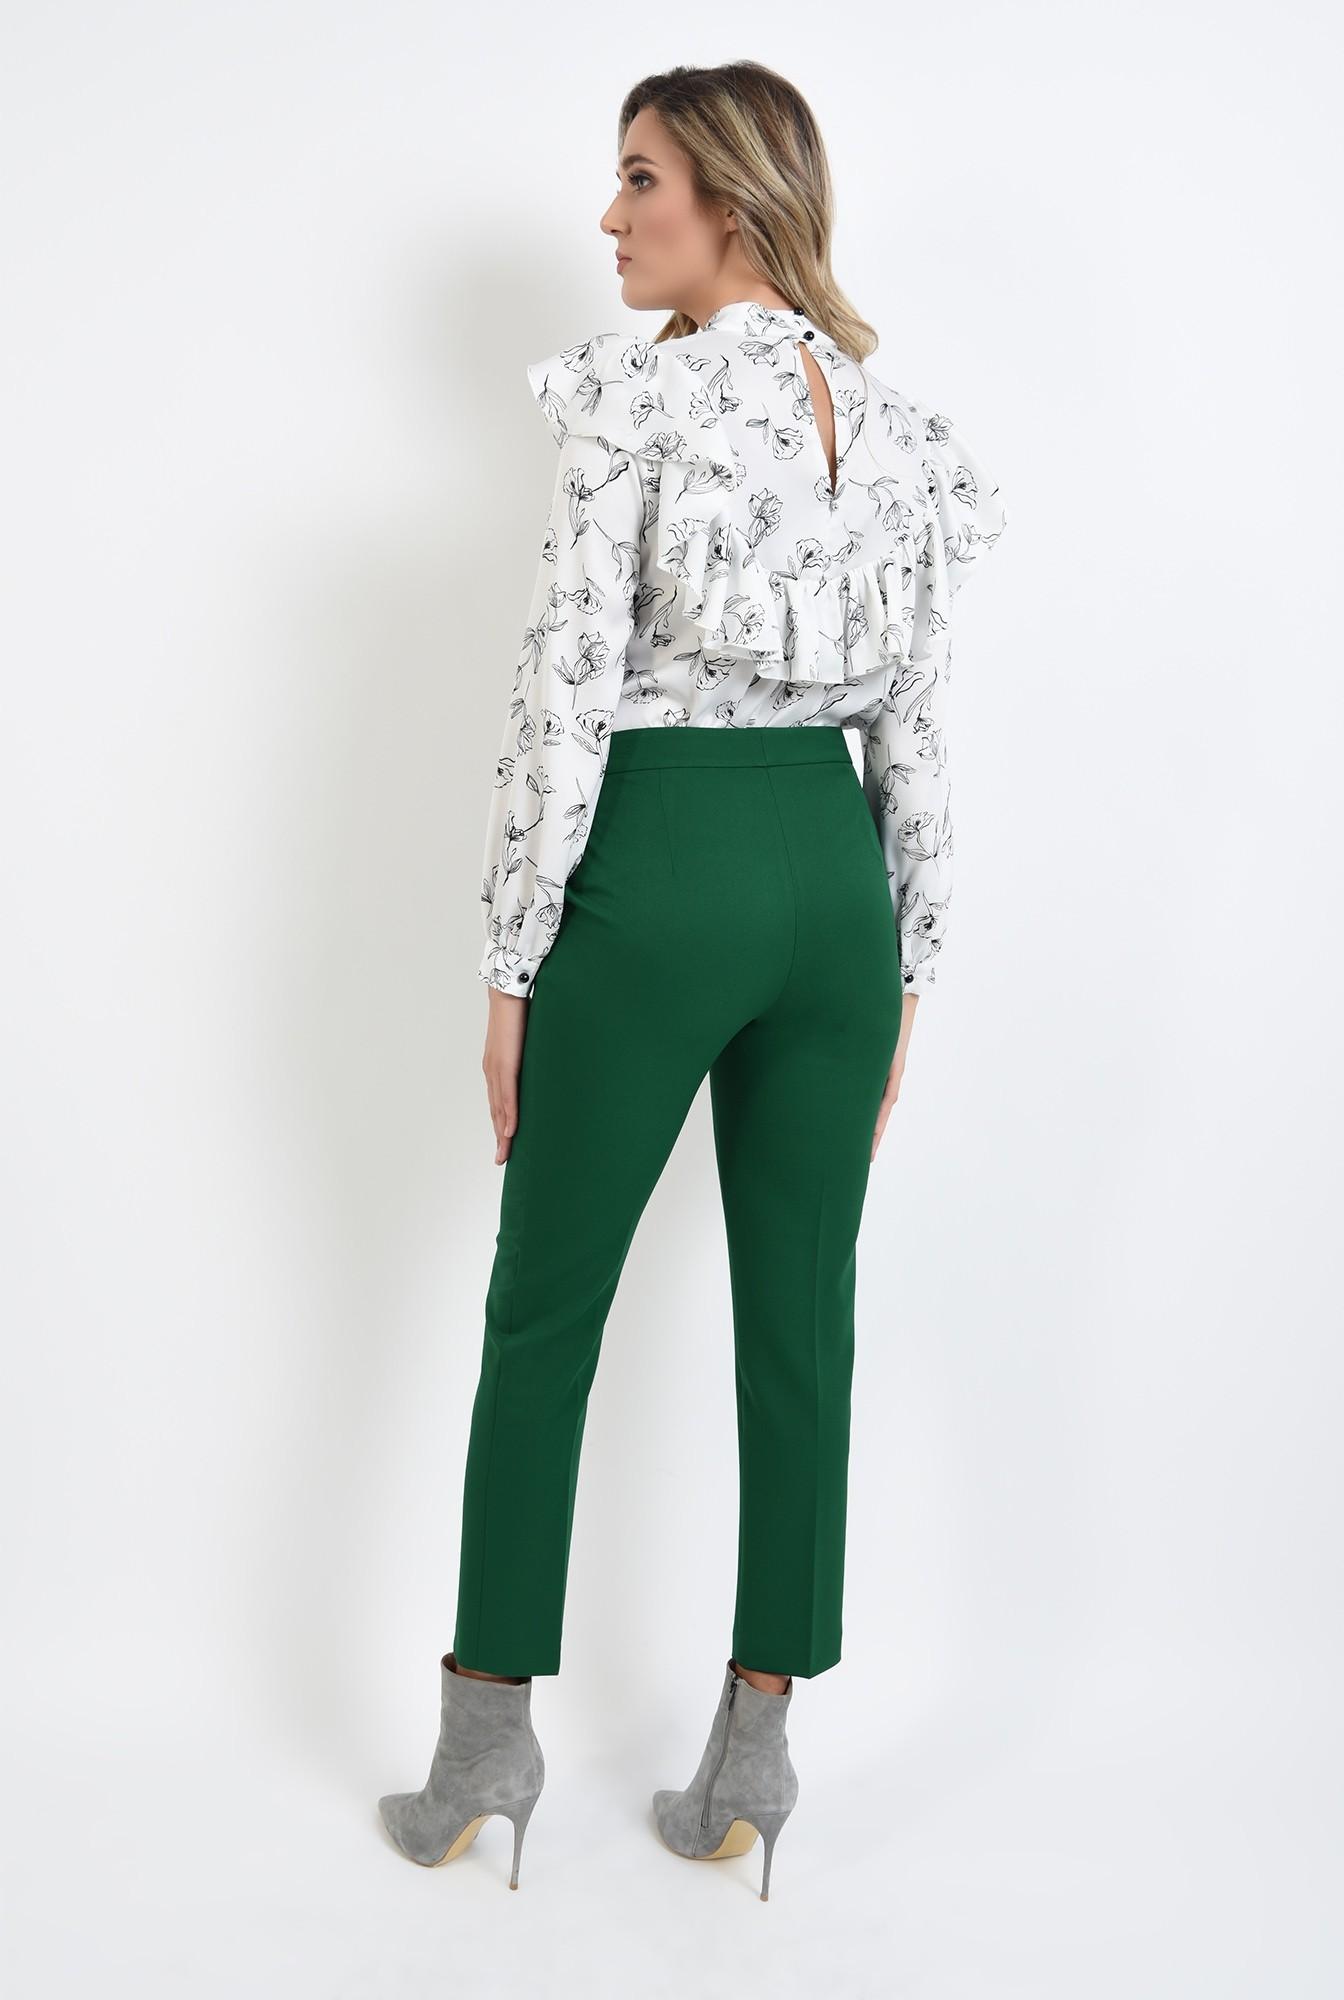 1 - pantaloni cu talie medie, croi conic, casual